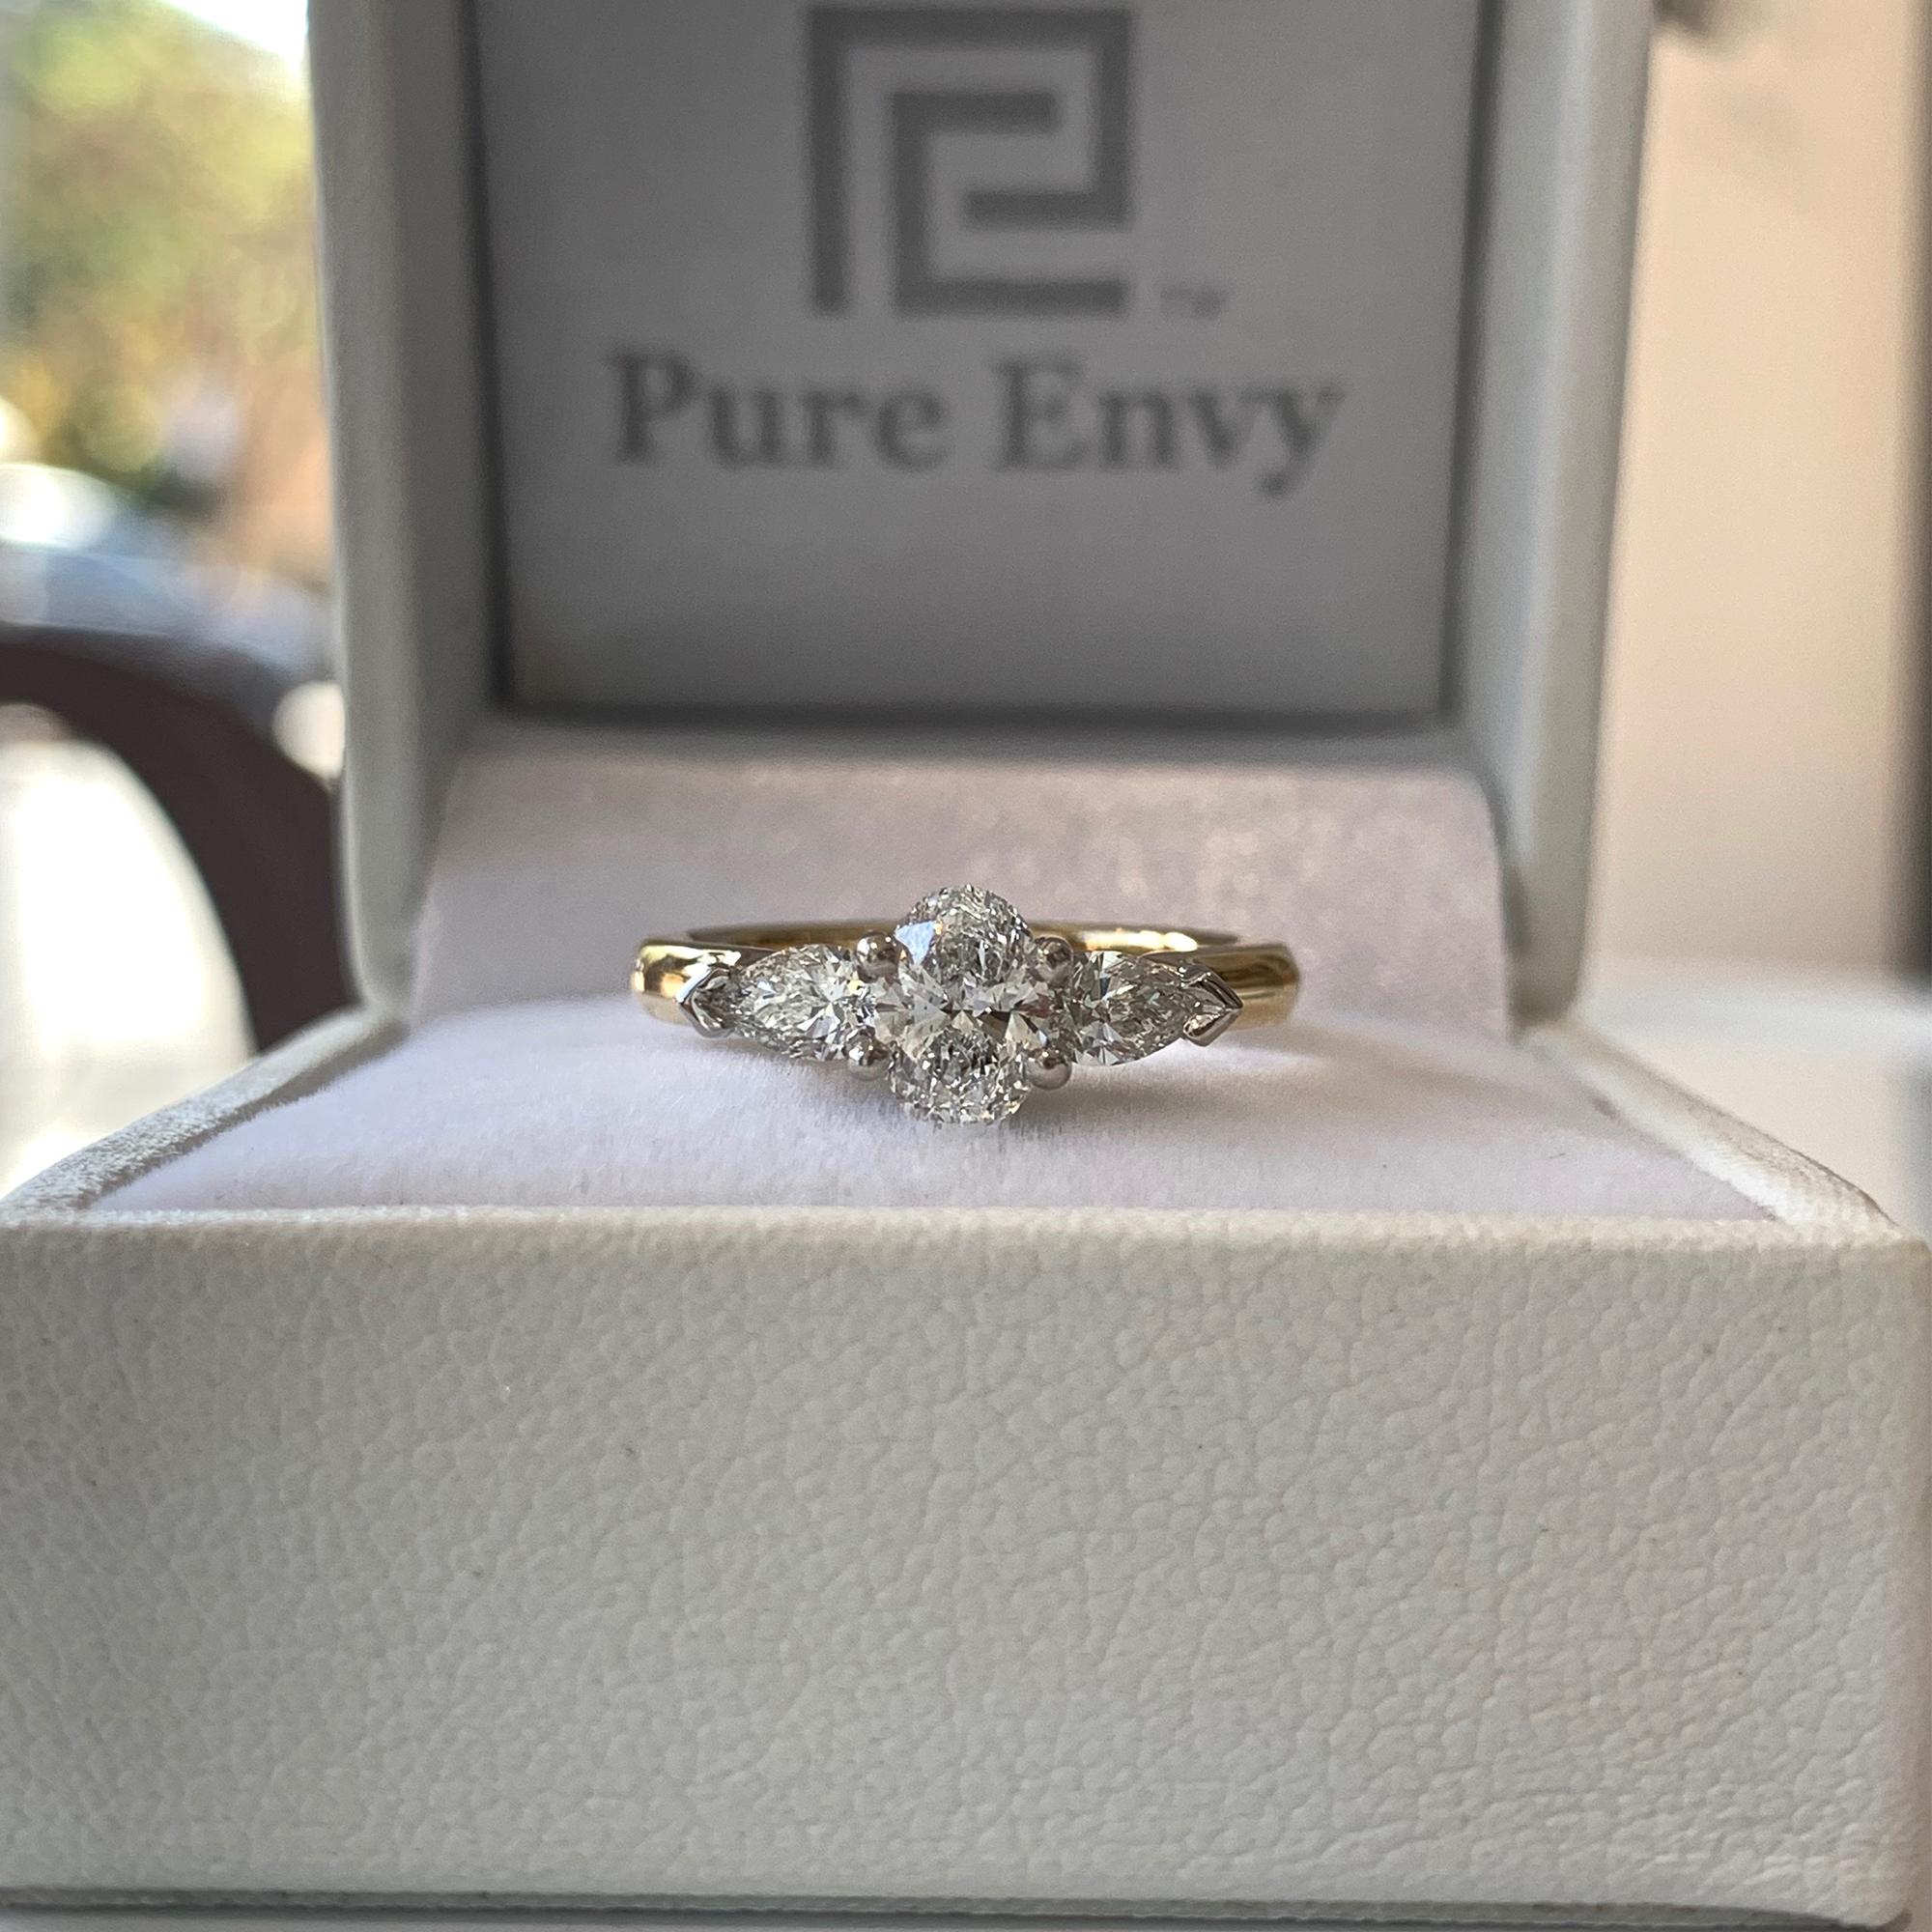 3 stone engagement rings australia